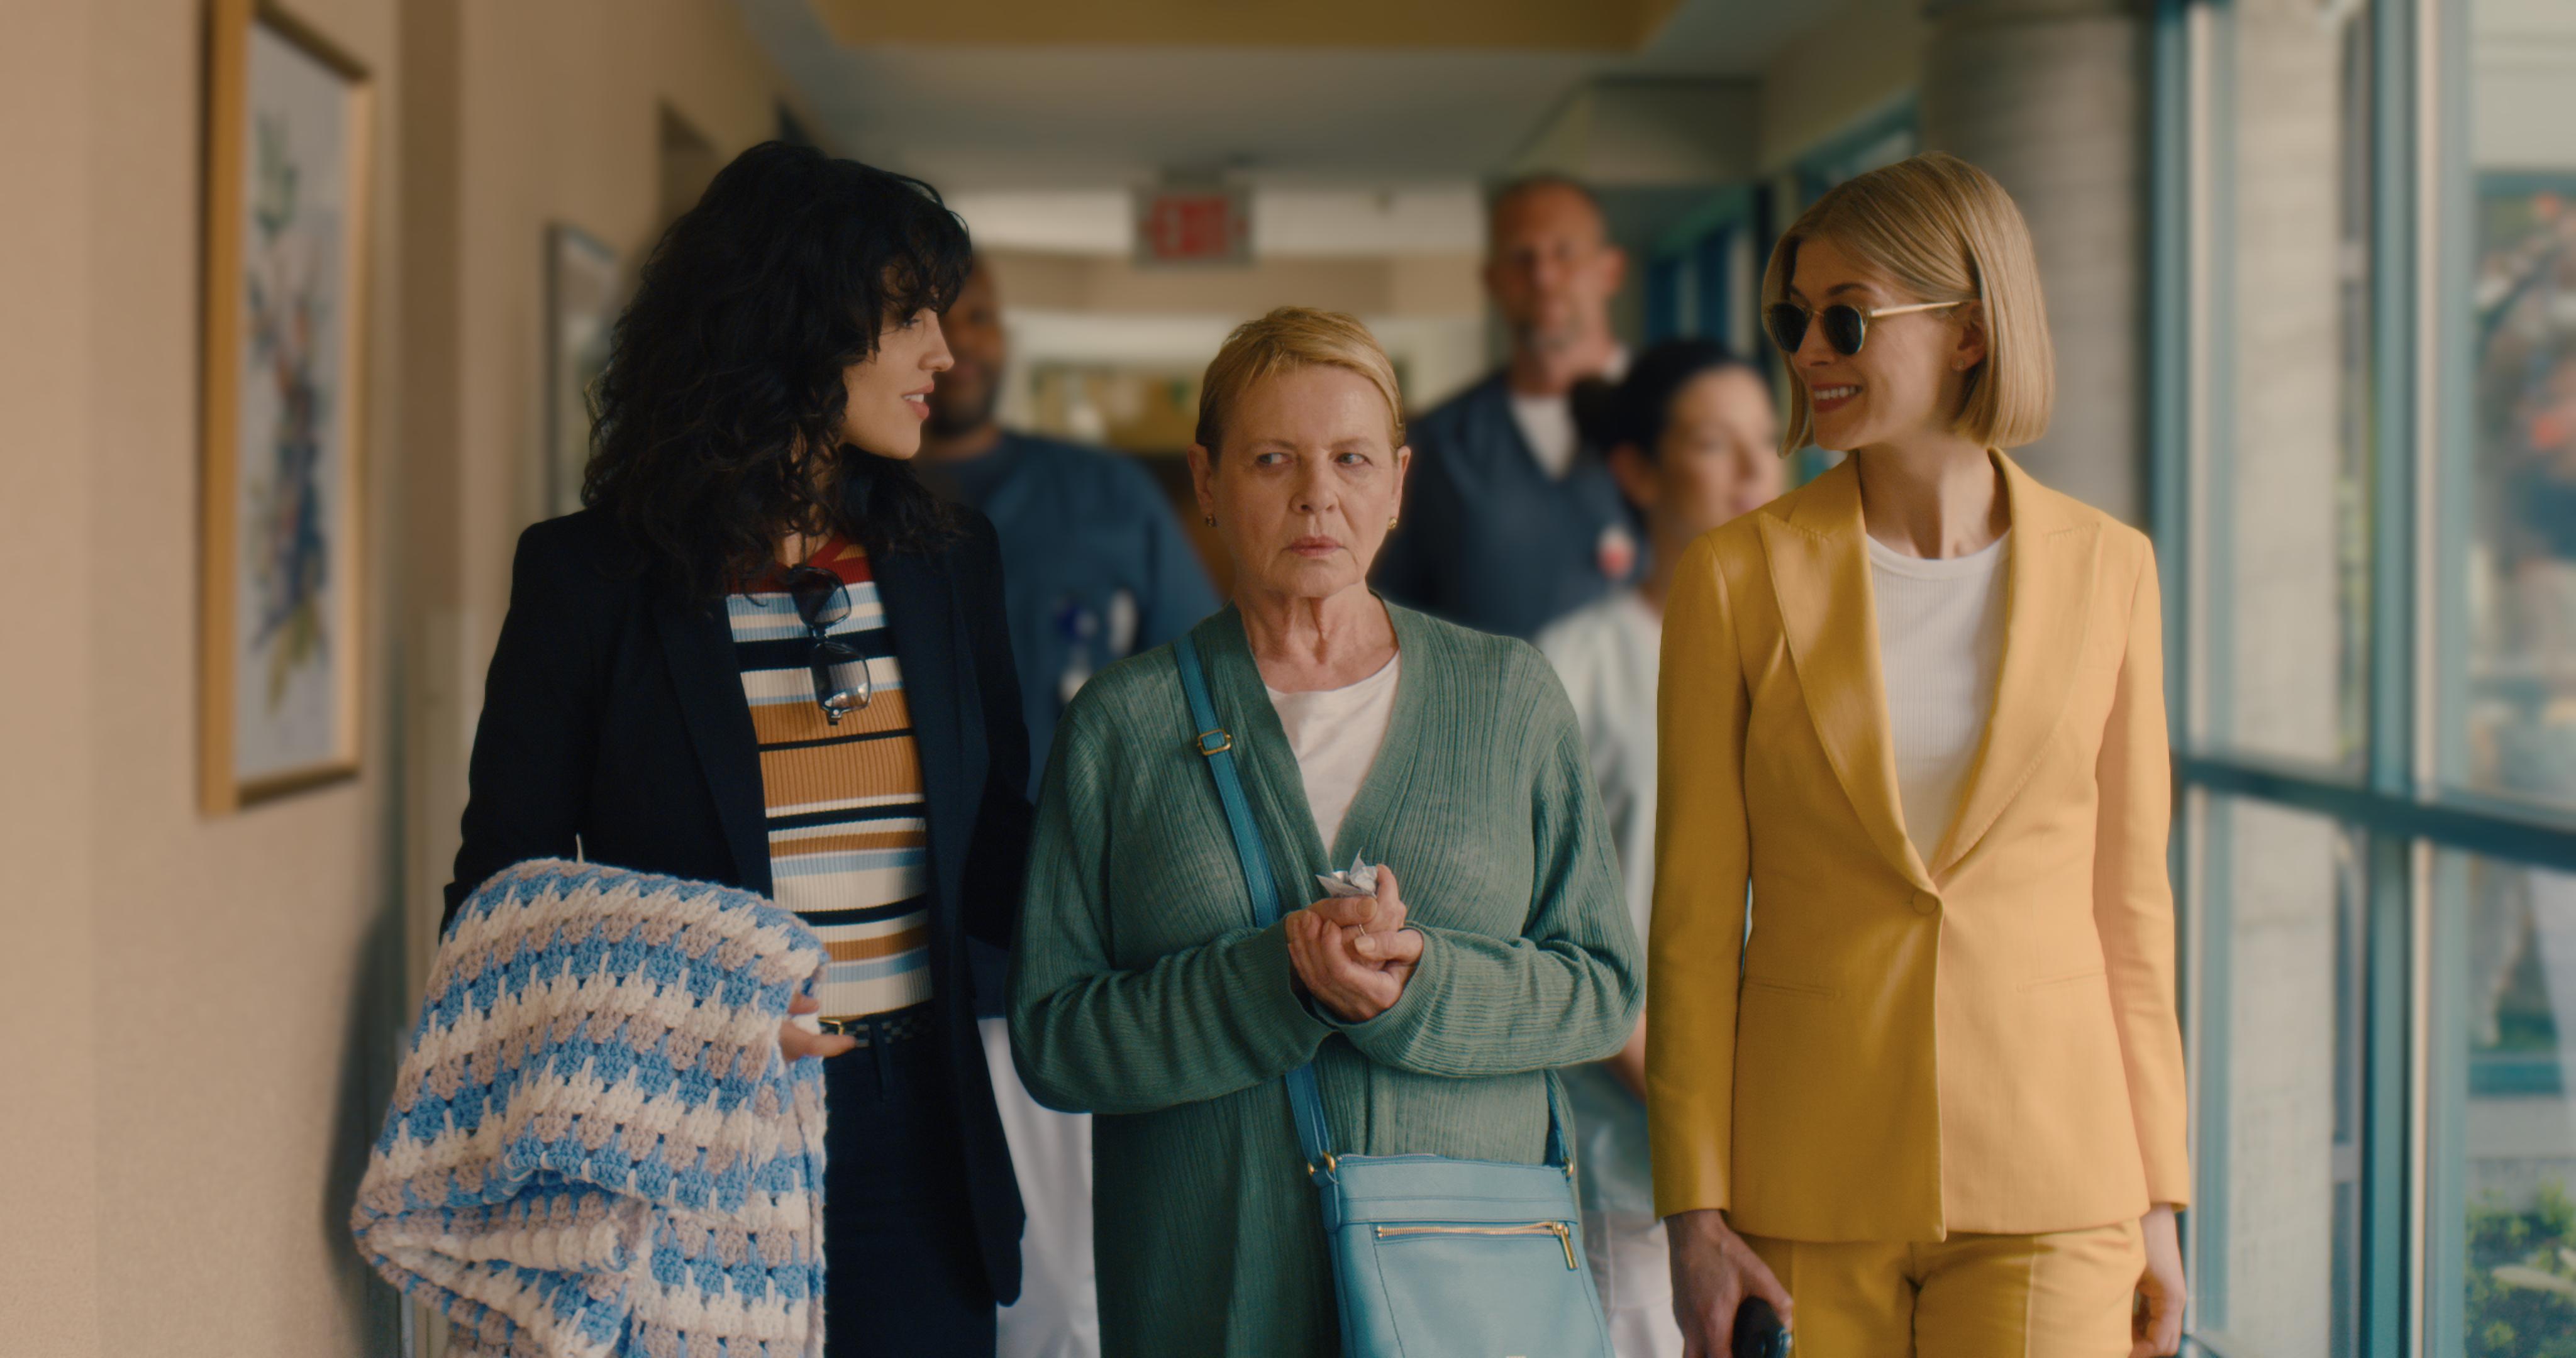 Eiza Gonzalez's Fran and Rosamund Pike's Marla accompany their victim, Jennifer (Dianne Wiest, center) to a nursing home